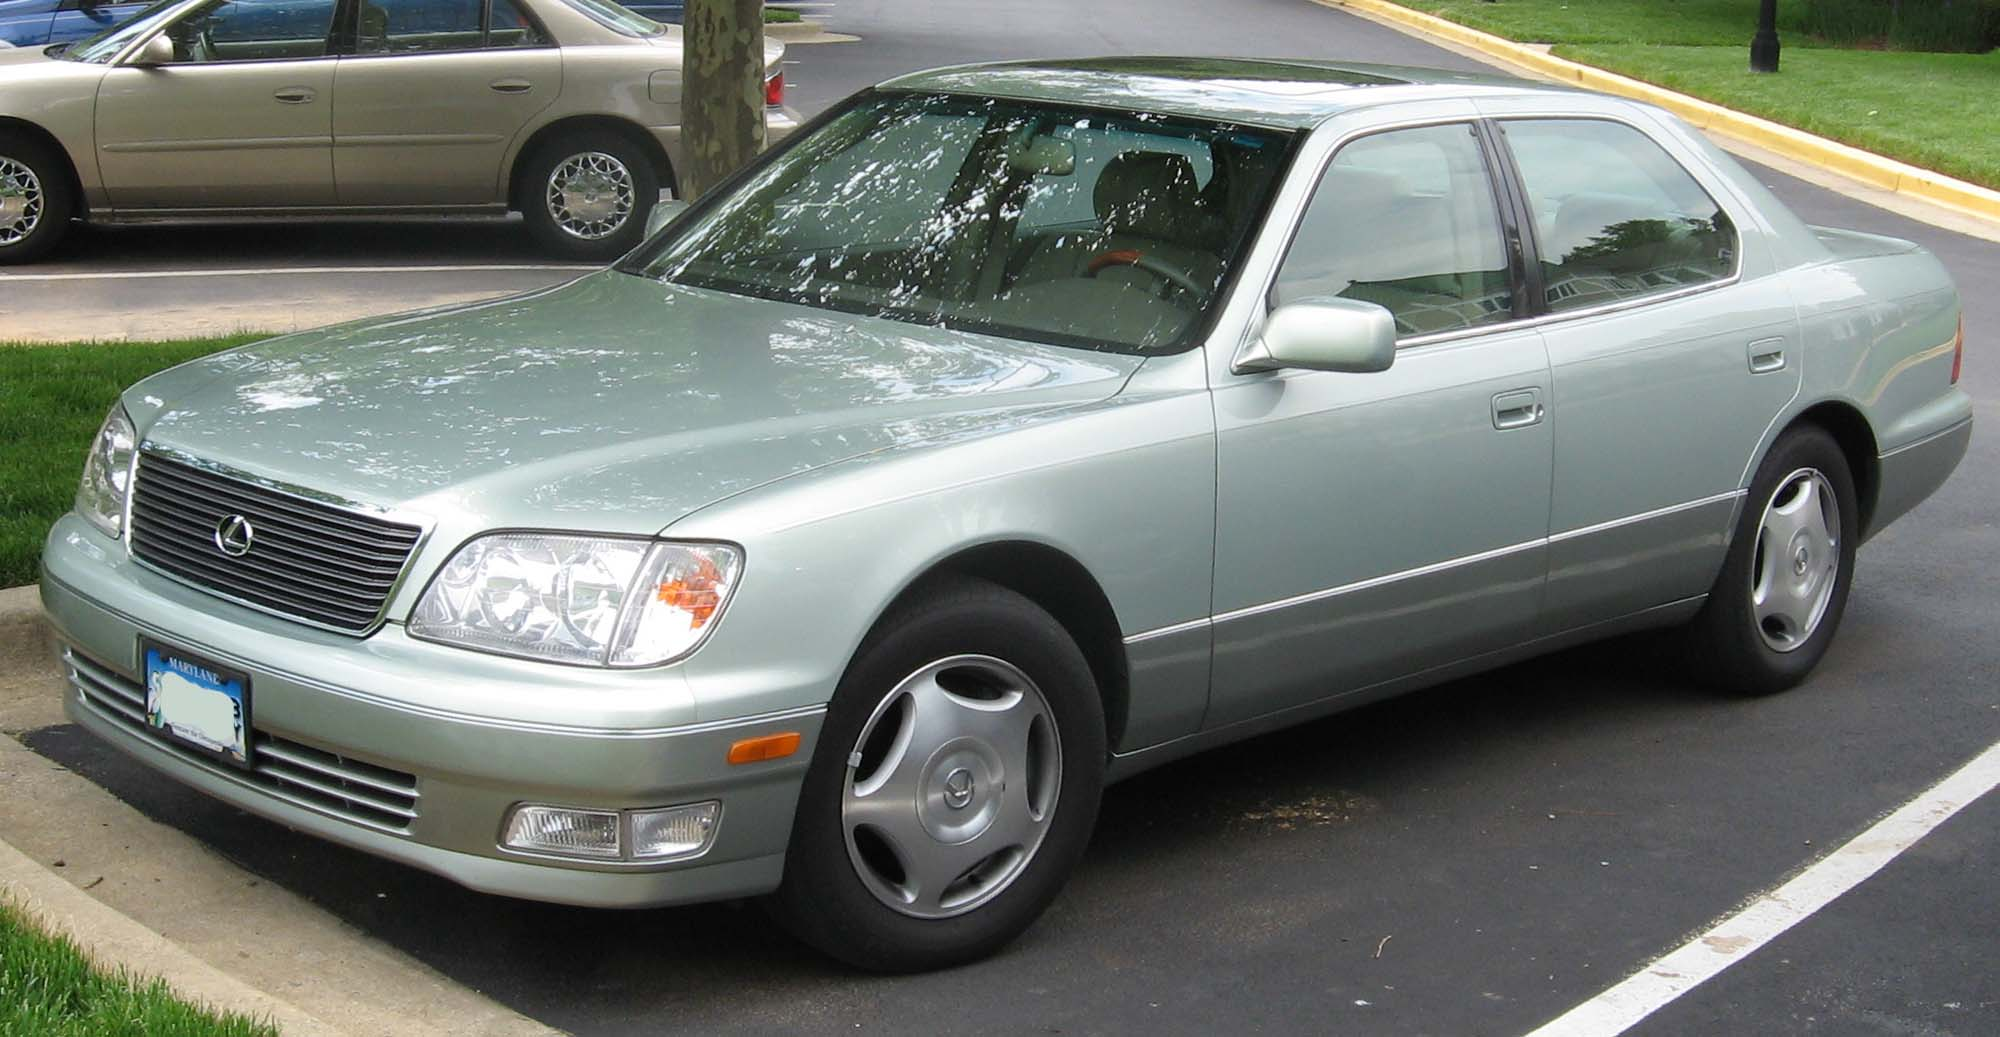 File:1998-00 Lexus LS400.jpg - Wikimedia Commons